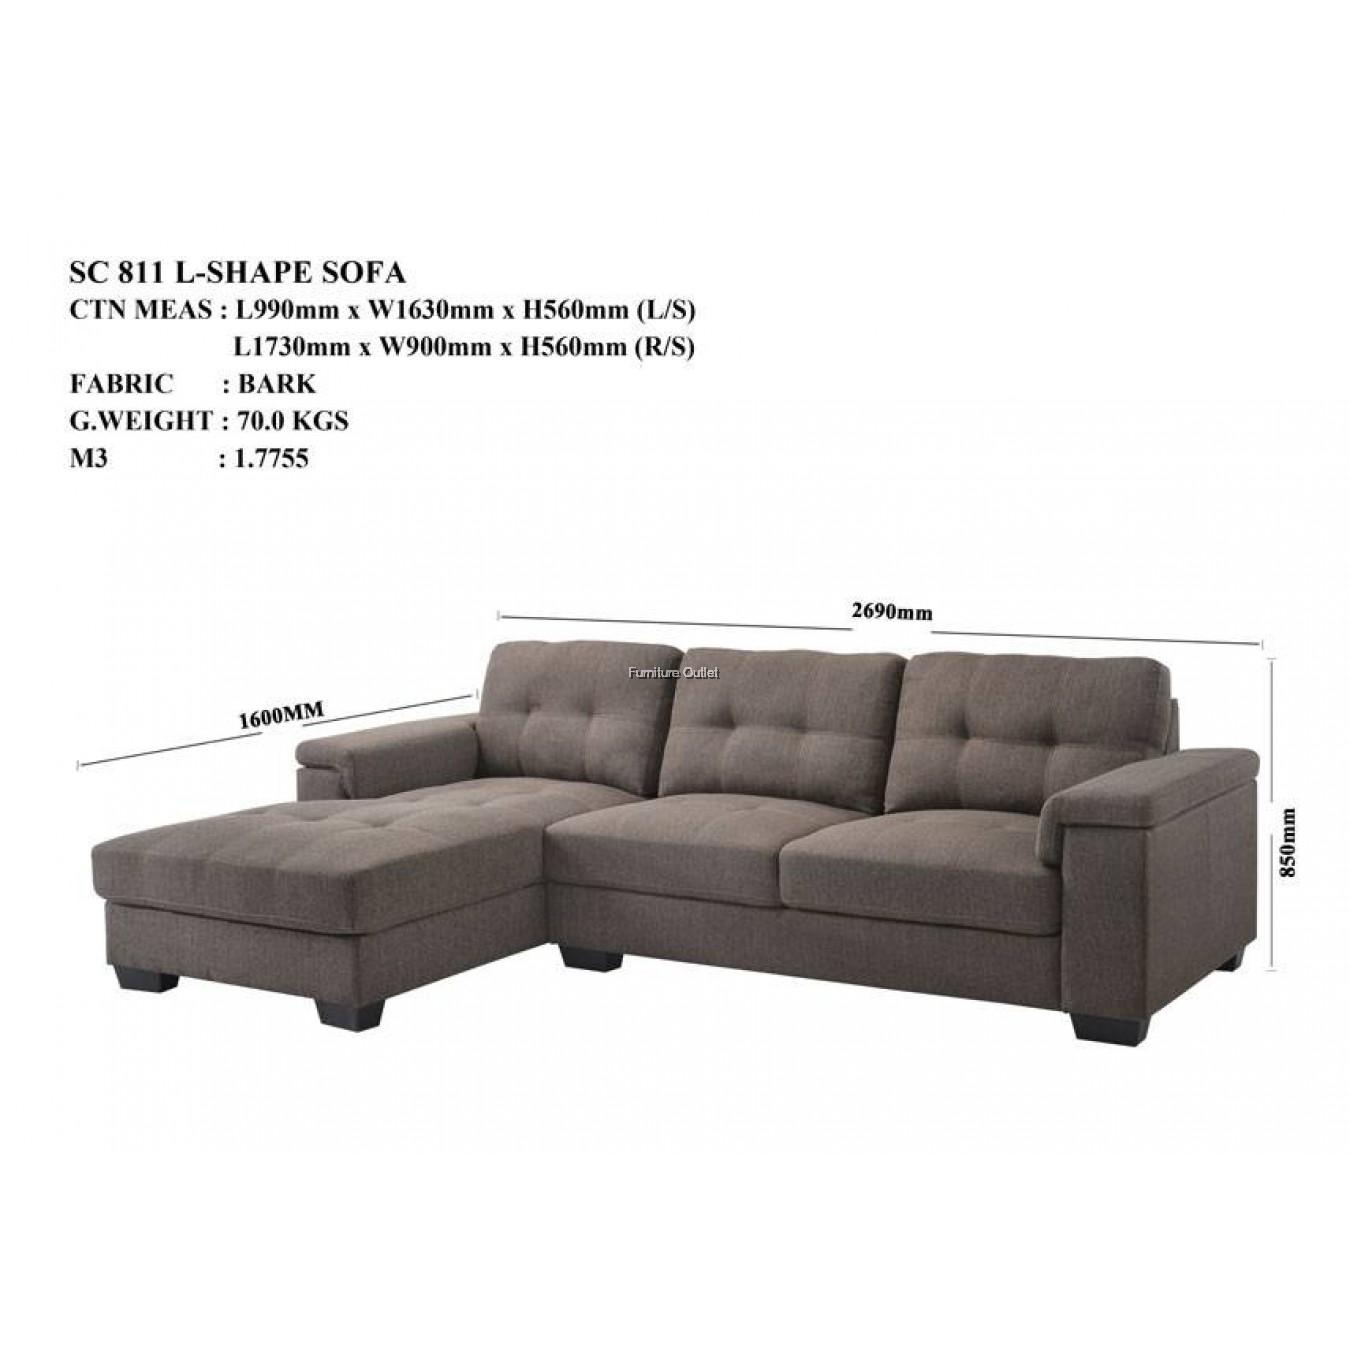 SC 811 L-Shape Sofa